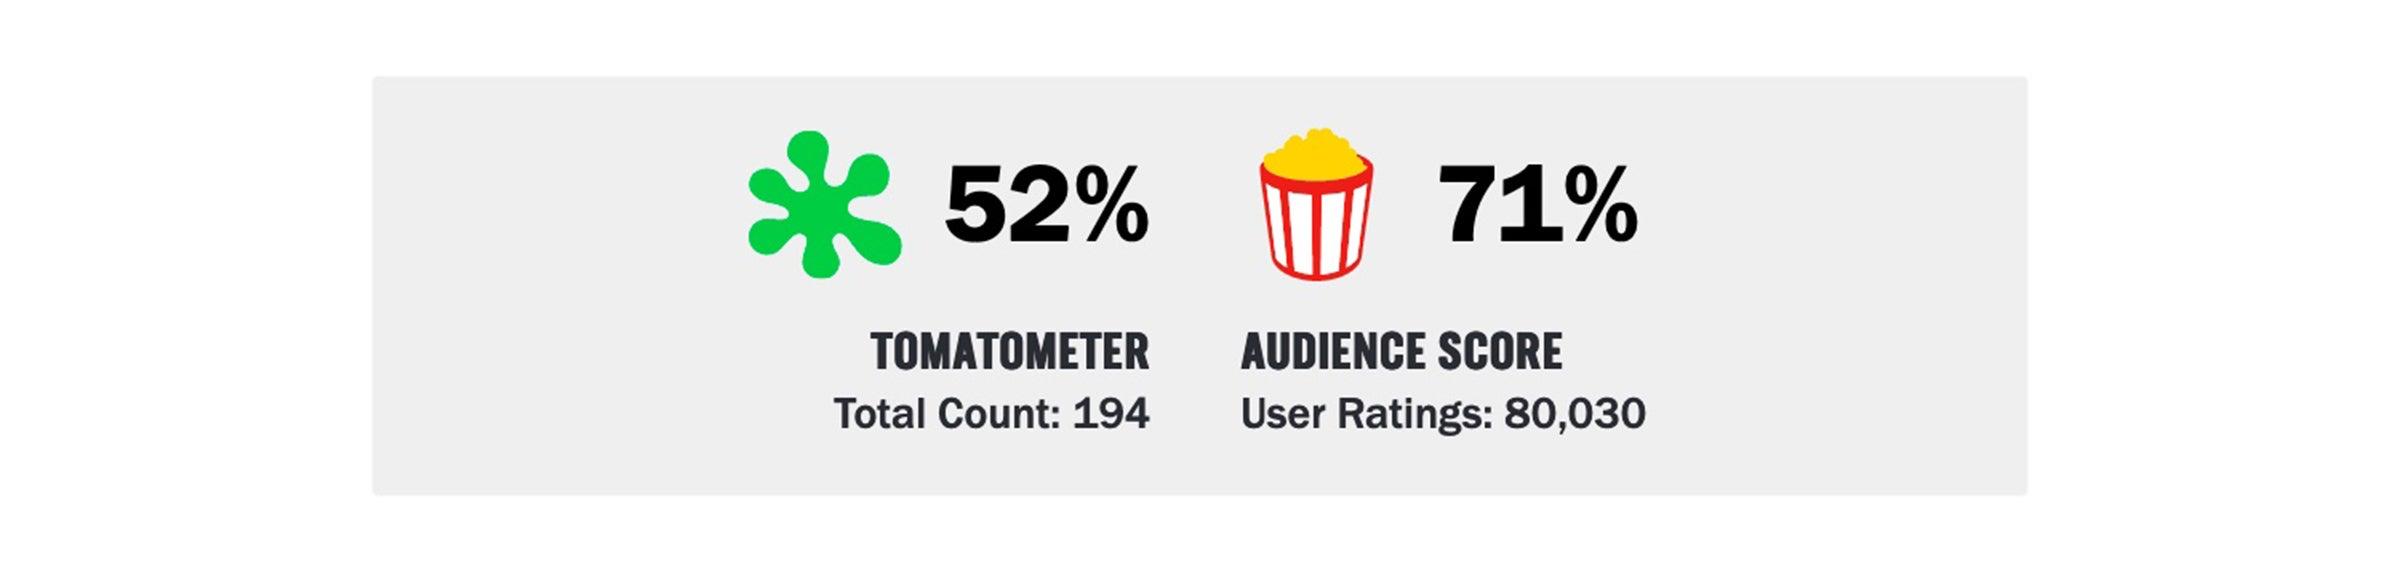 Tomatometer vs Audience Score